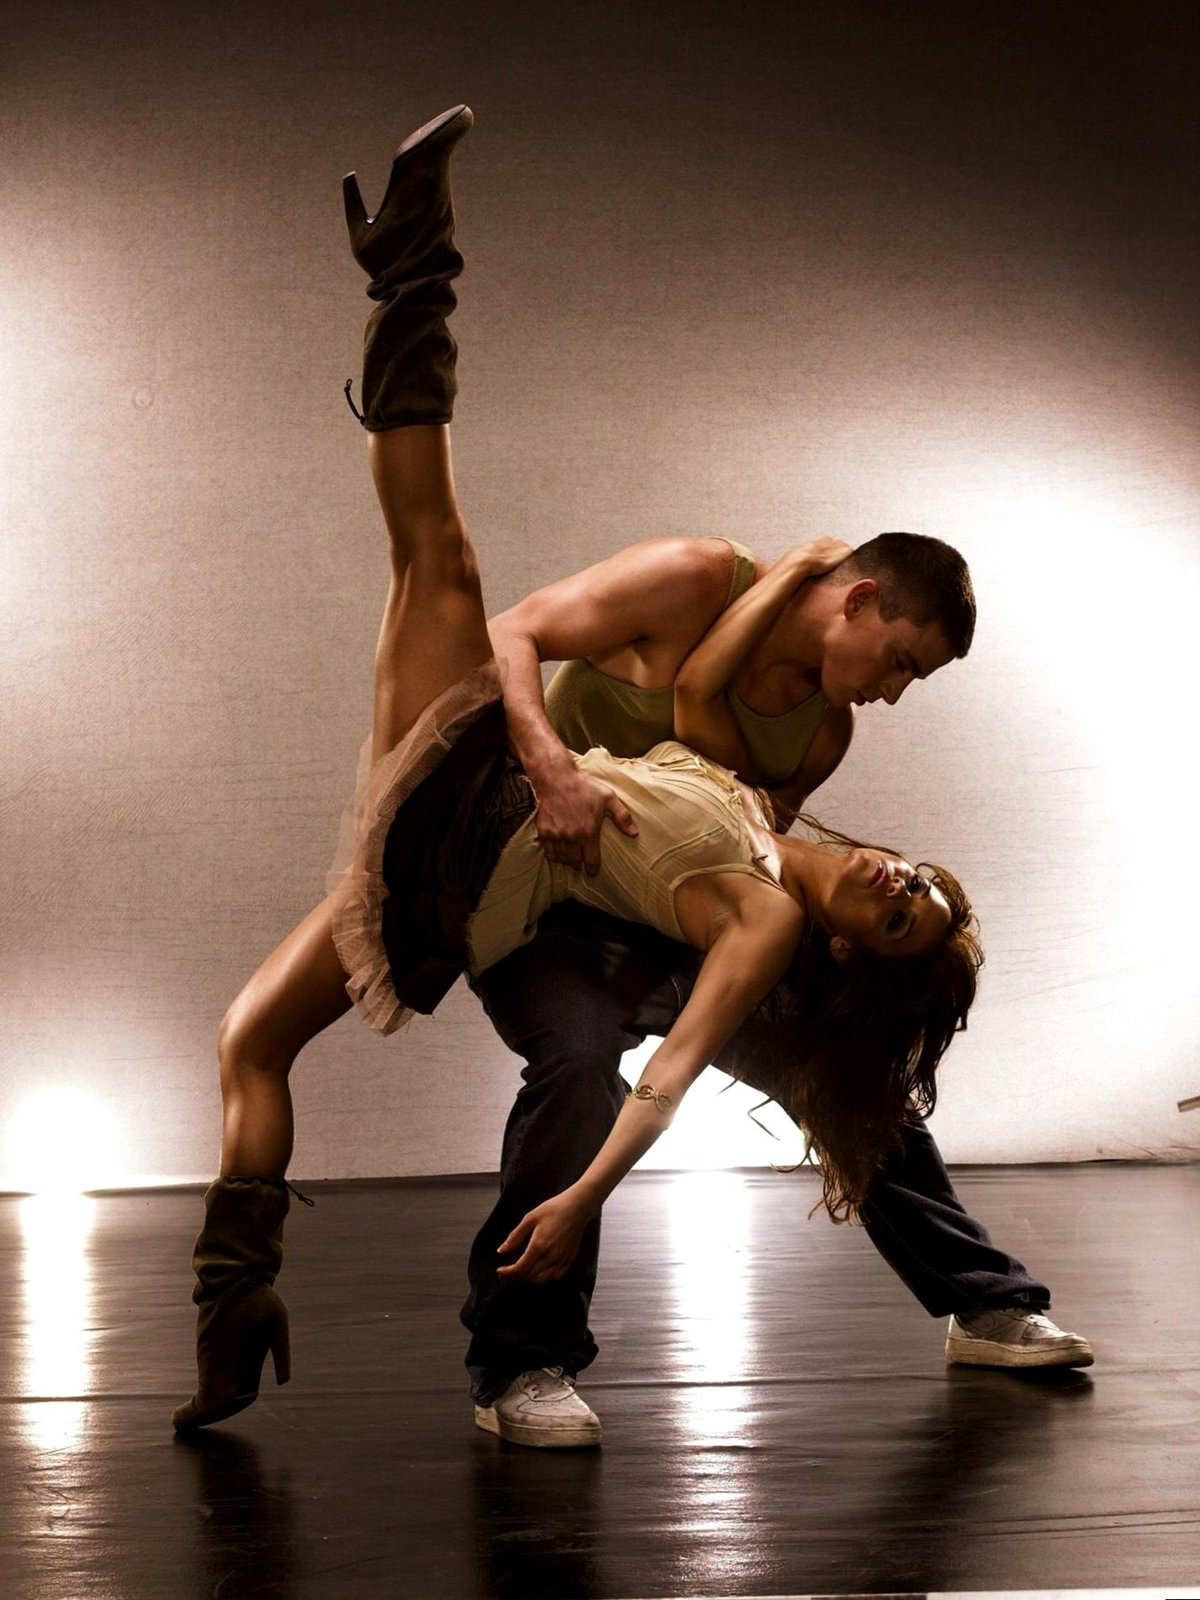 телка танцует для парня парное секс